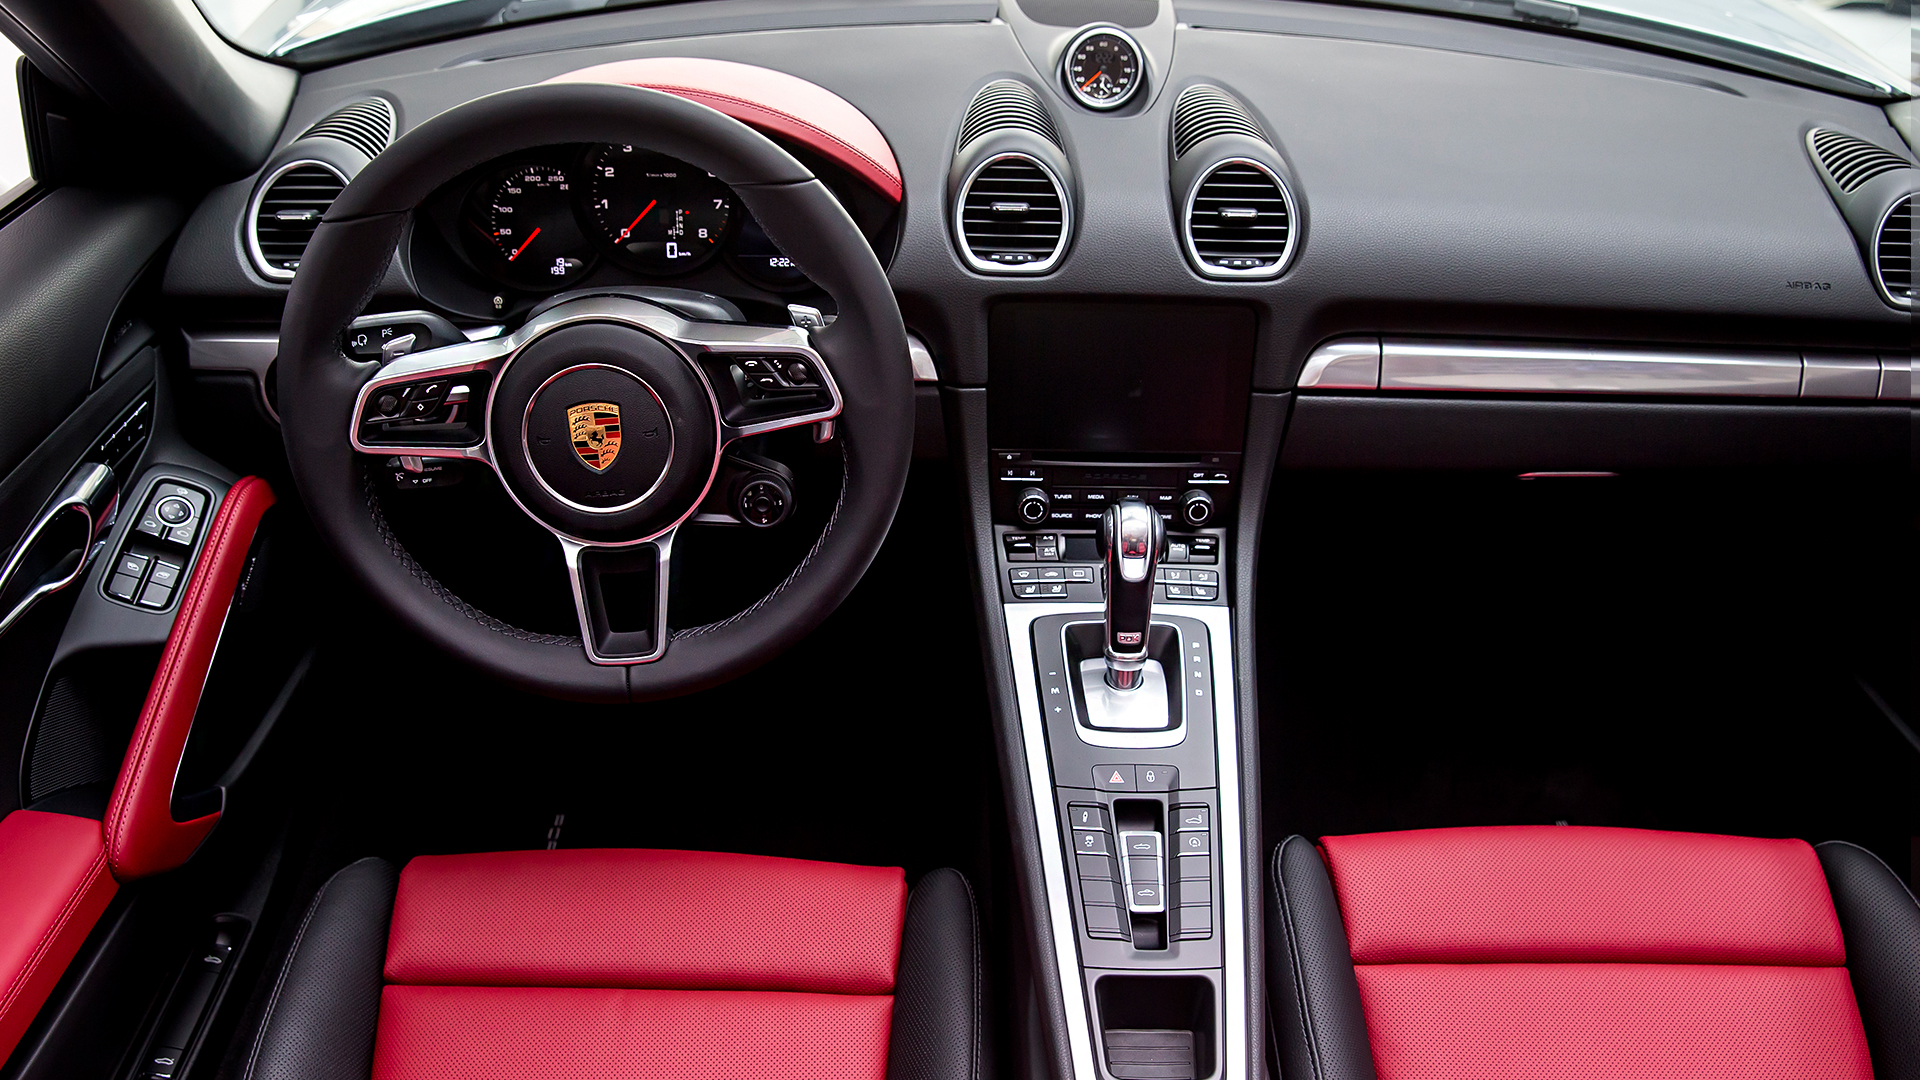 Porsche 718 2017 Cayman - Price, Mileage, Reviews